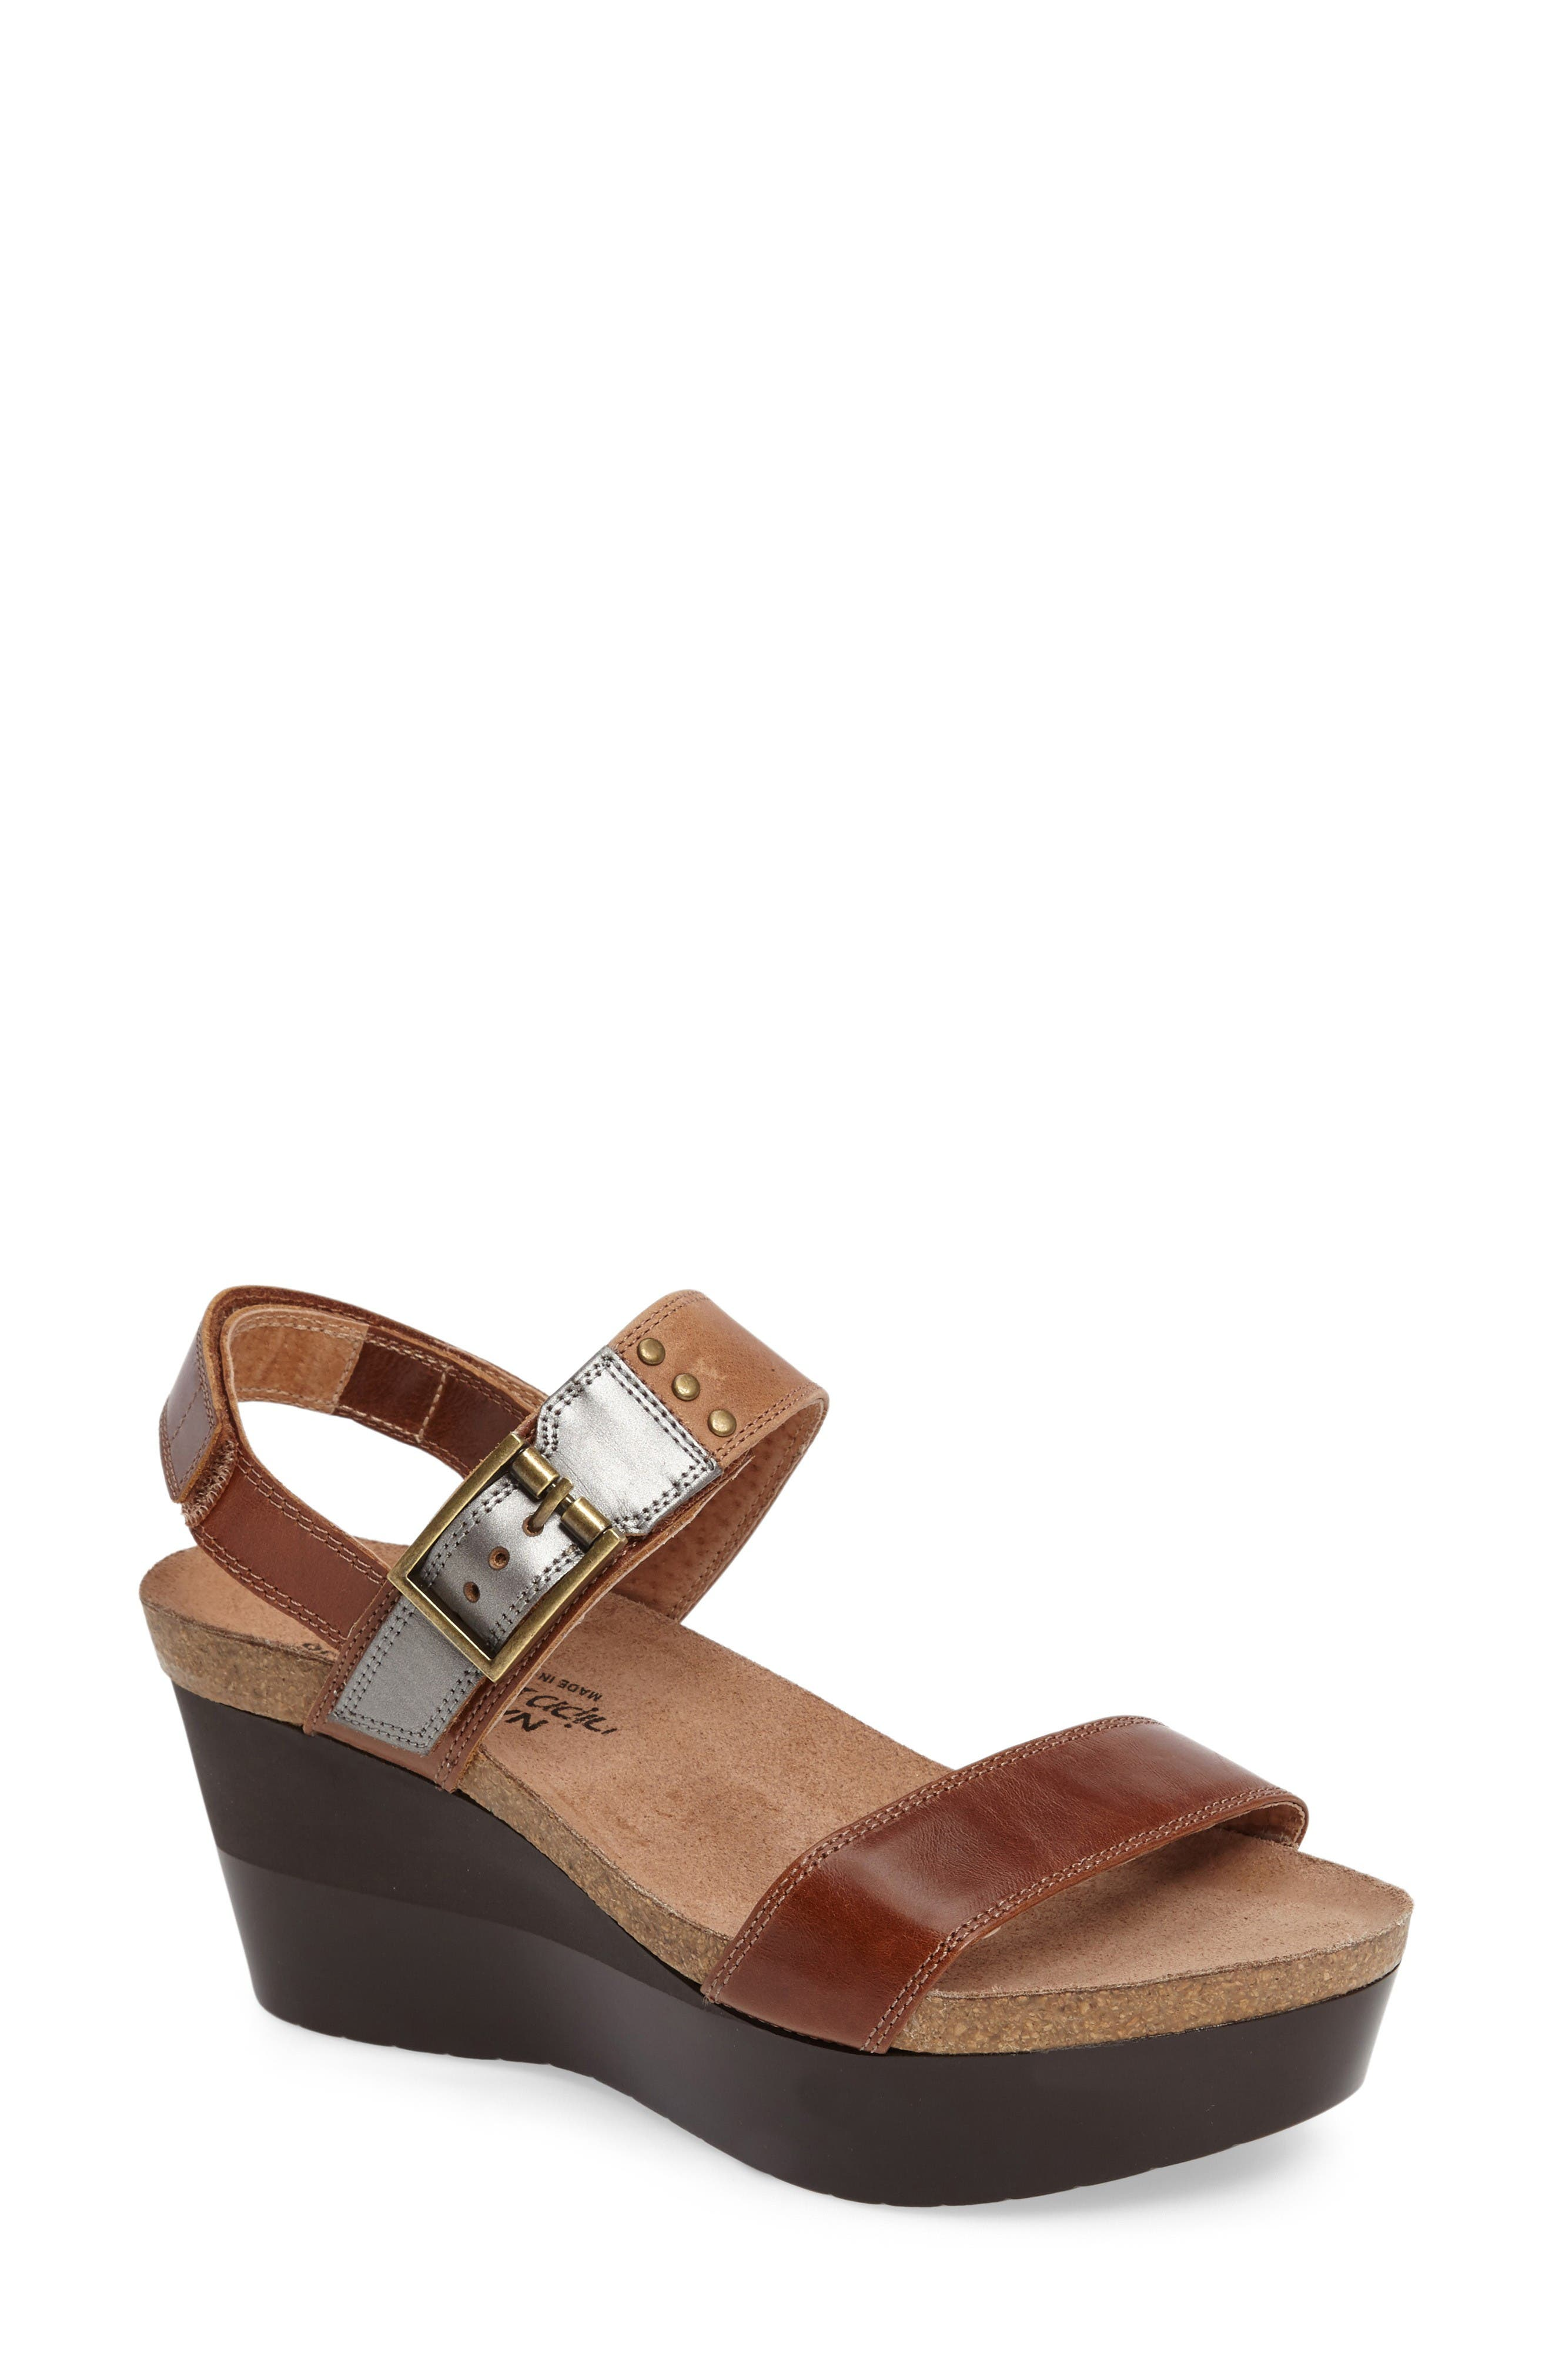 Alternate Image 1 Selected - Naot Alpha Platform Wedge Sandal Sandal (Women)